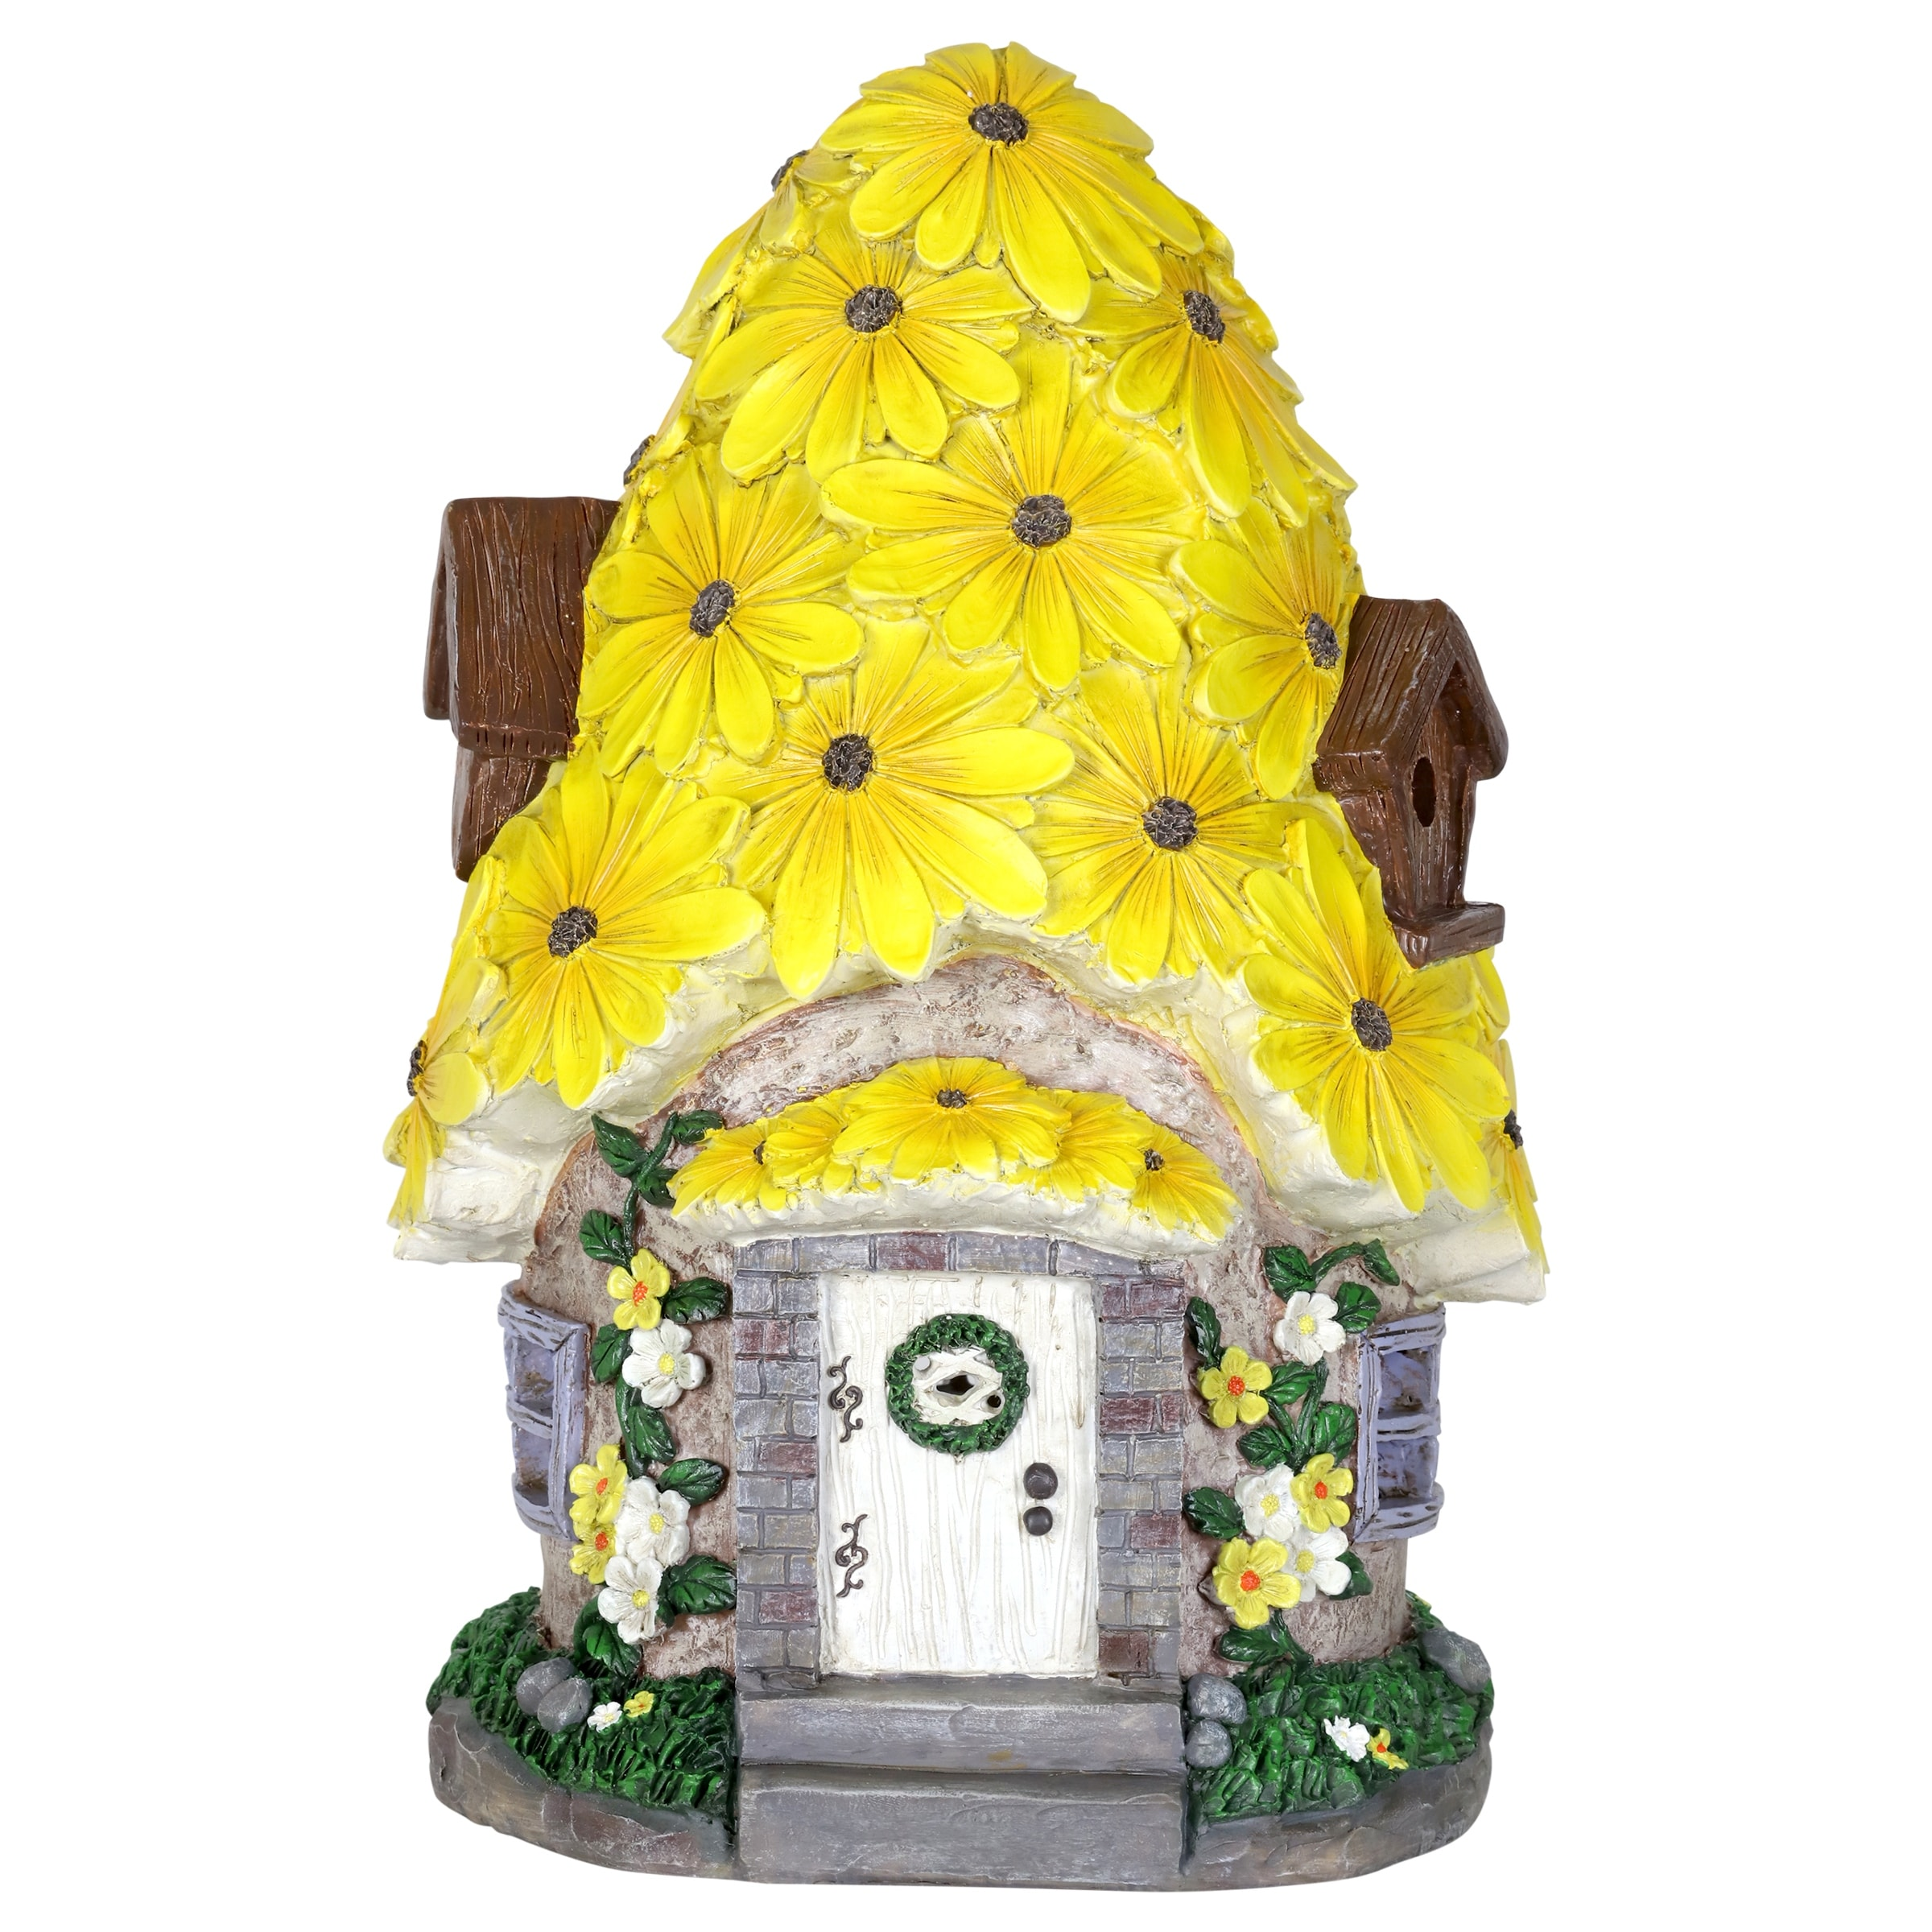 Fairy House Solar Garden Ornament Pixie Lawn Secret Gift Flower Roof